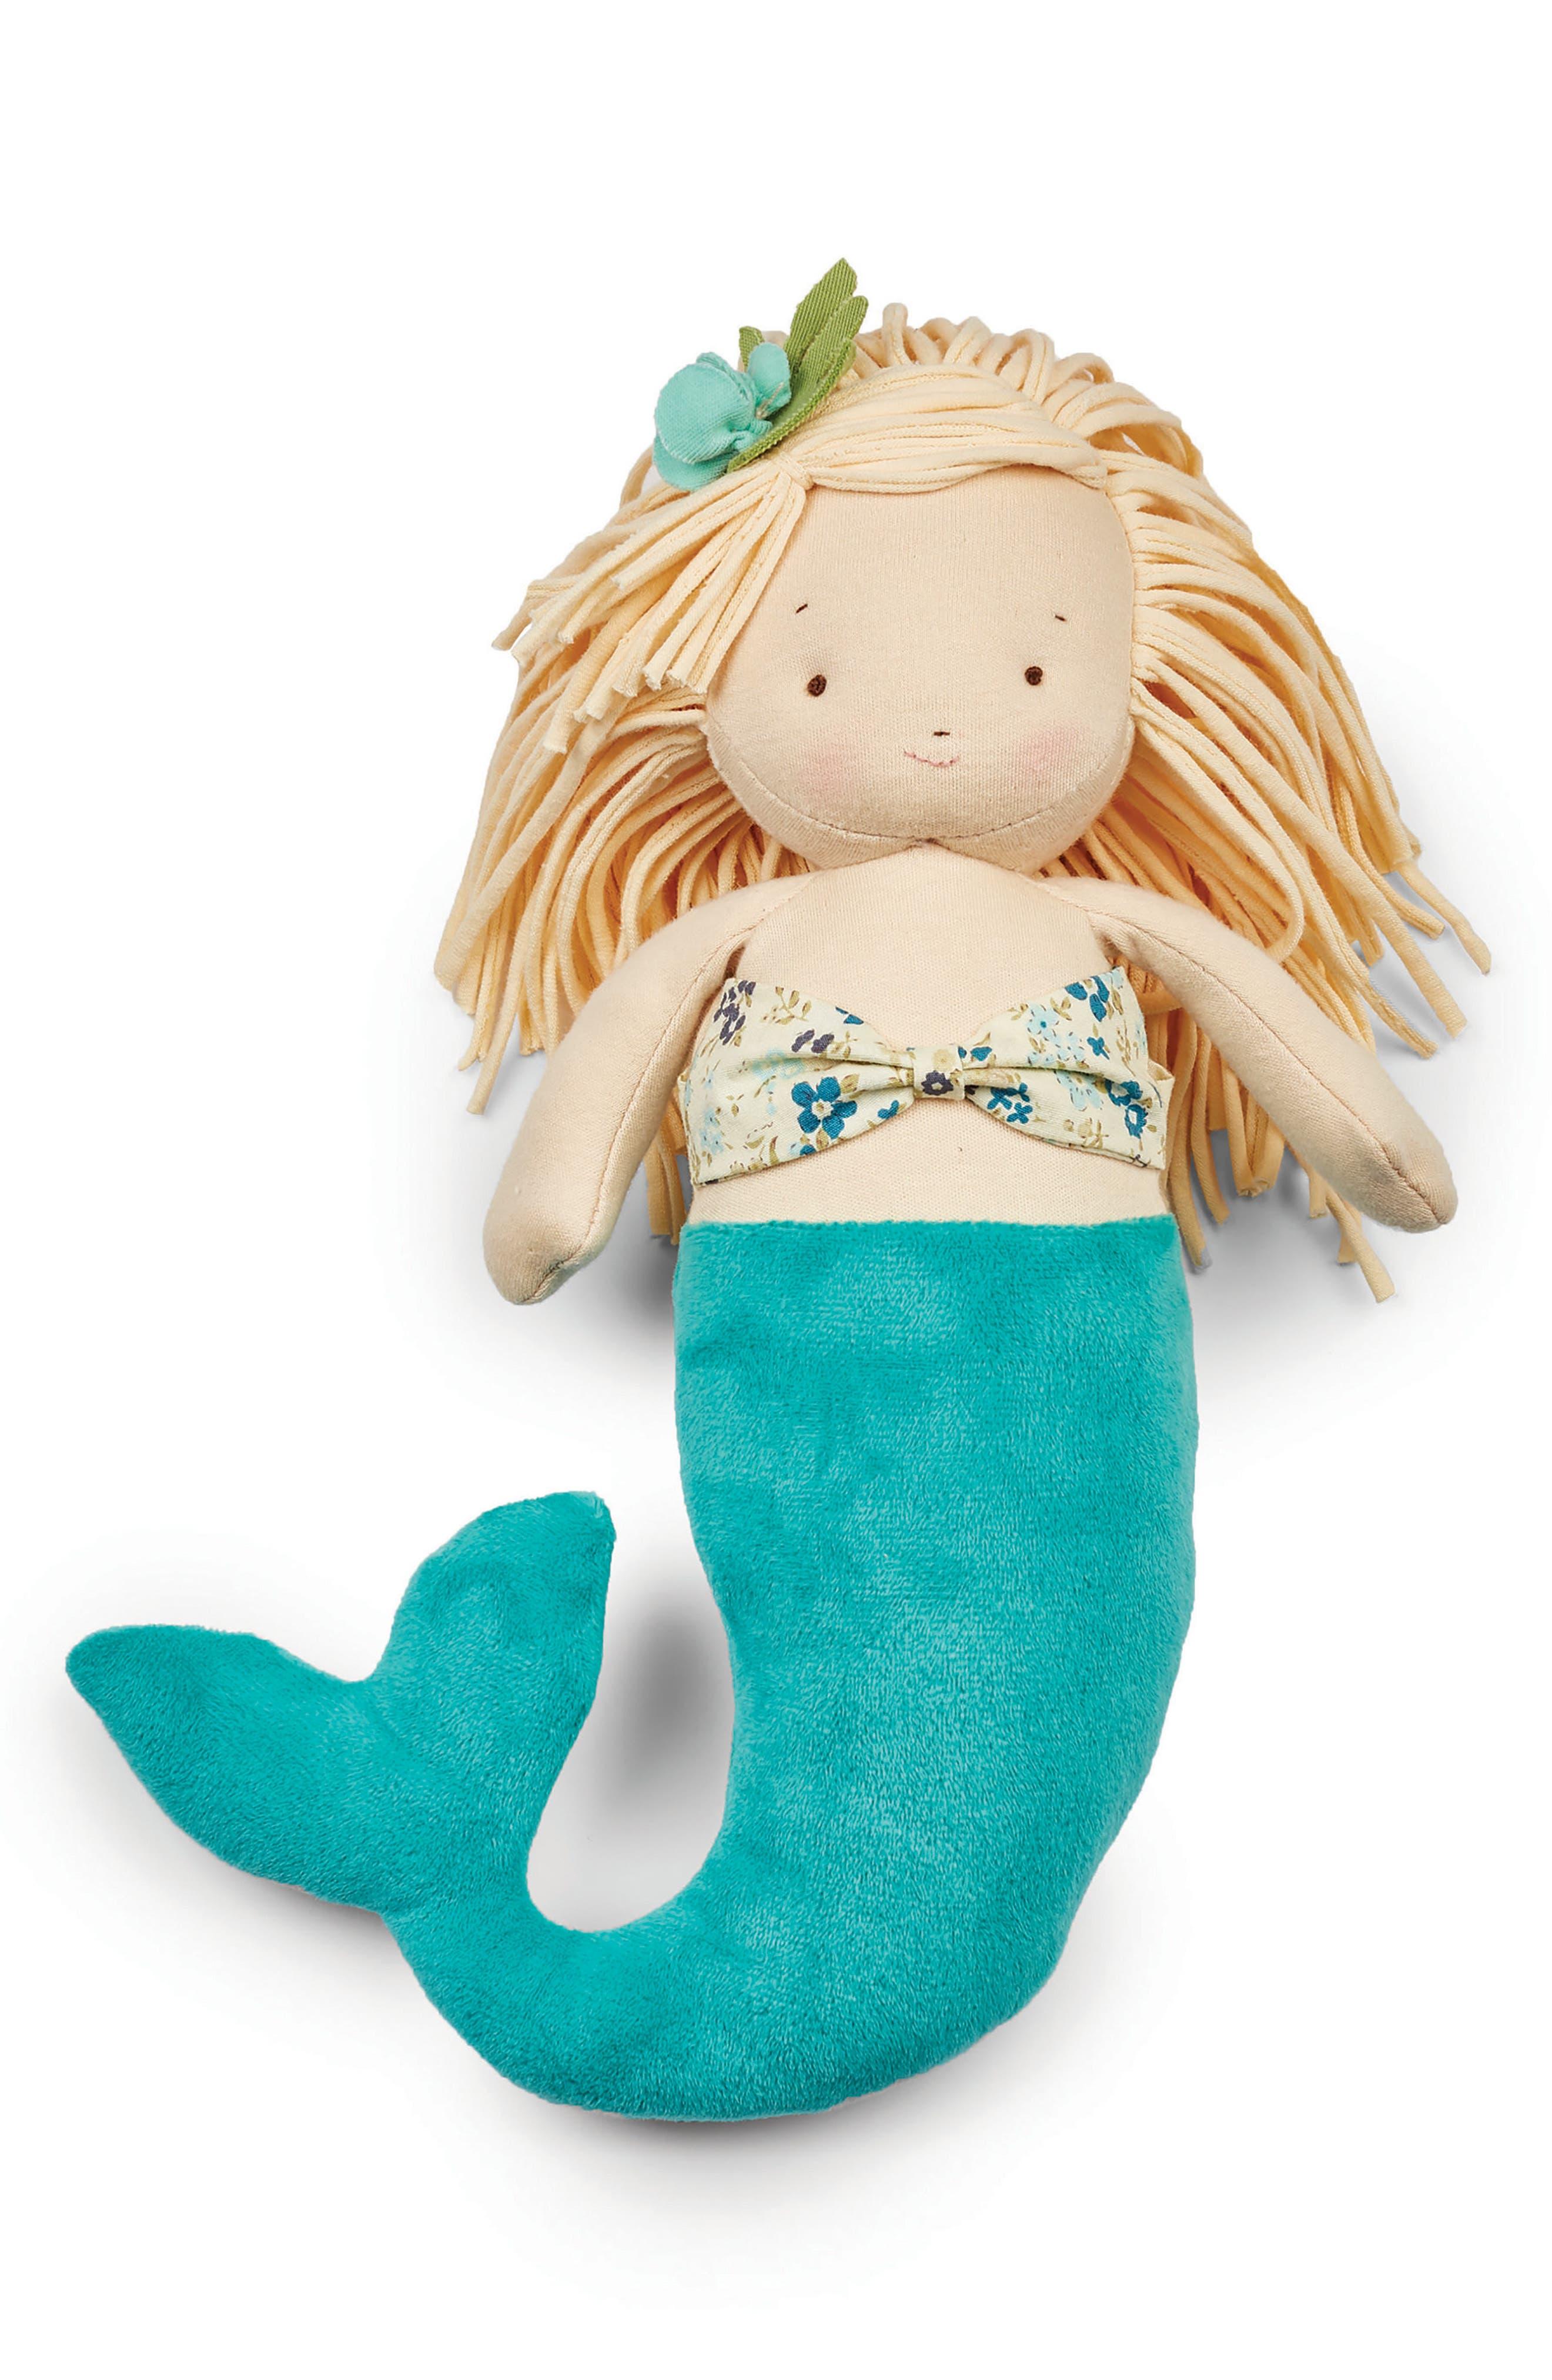 El-Sea Mermaid Doll,                             Main thumbnail 1, color,                             280